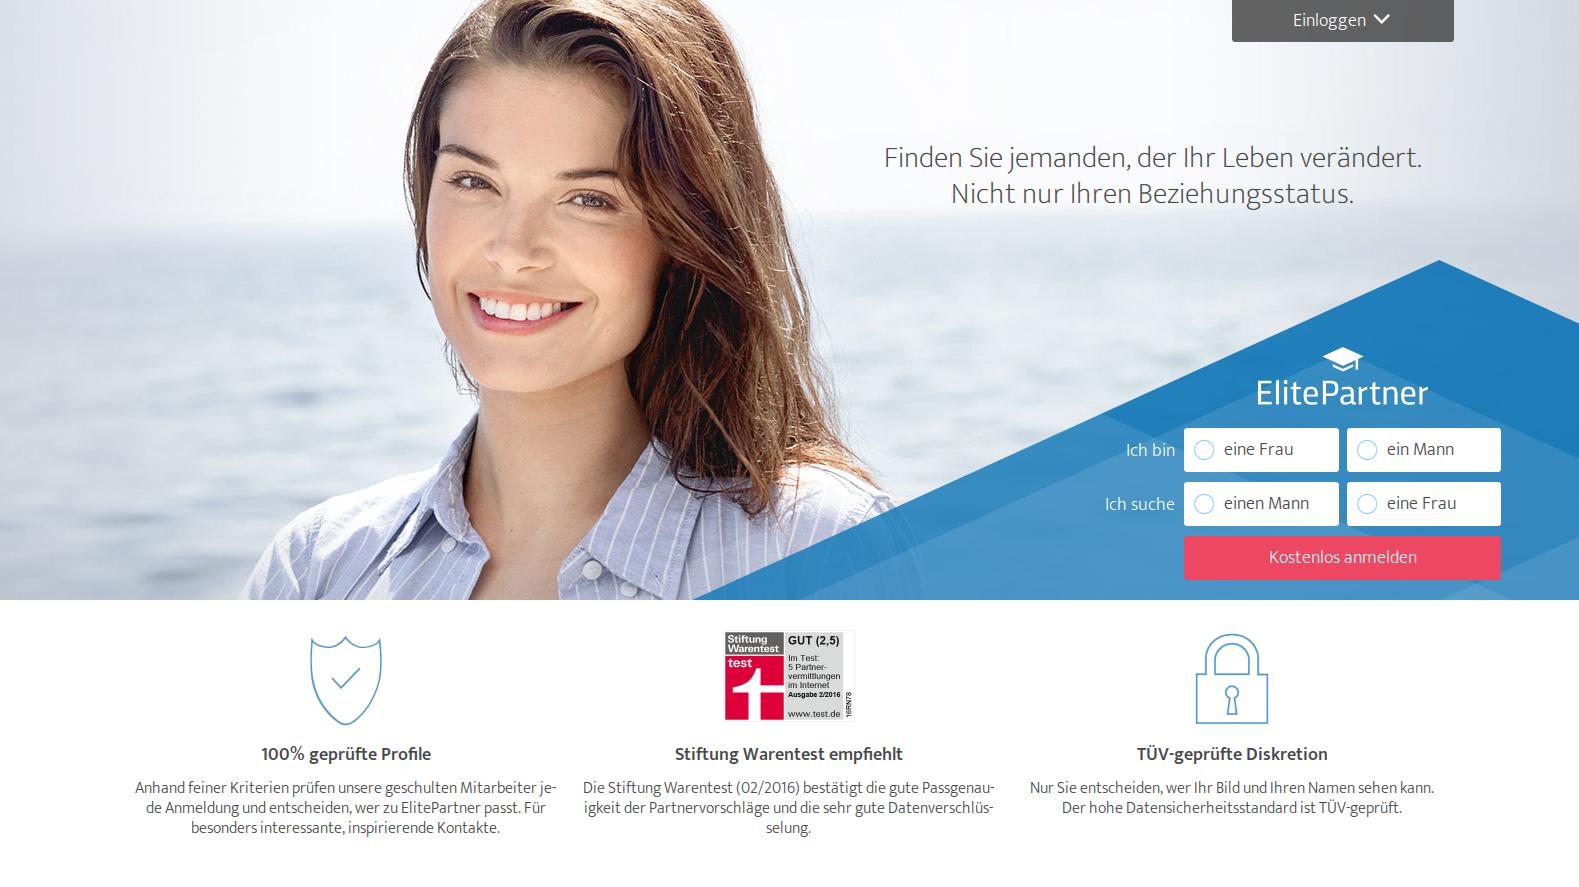 Kündigen Online Partnervermittlung